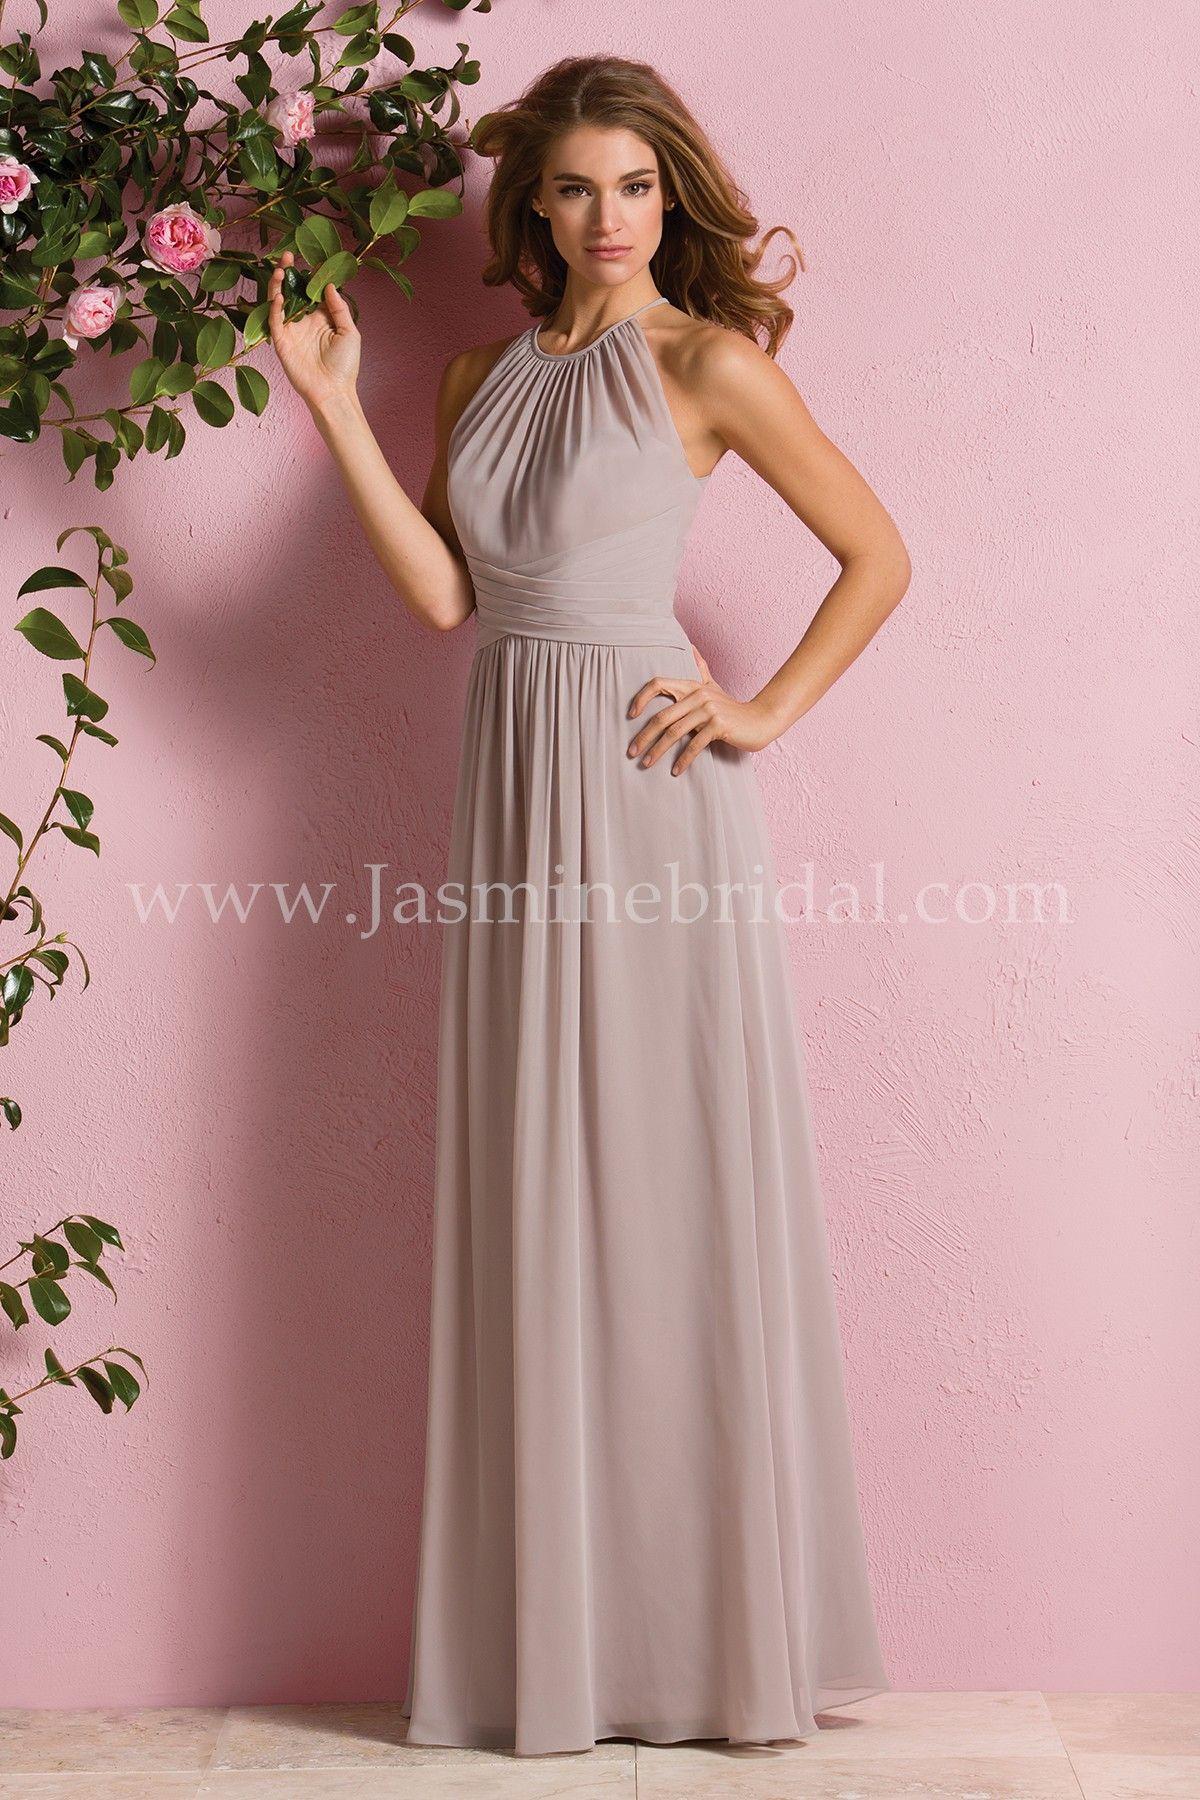 Jasmine bridal bridesmaid dress b2 style b173057 in taupe a jasmine bridal bridesmaid dress b2 style b173057 in taupe a beautiful poly chiffon bridesmaid ombrellifo Images